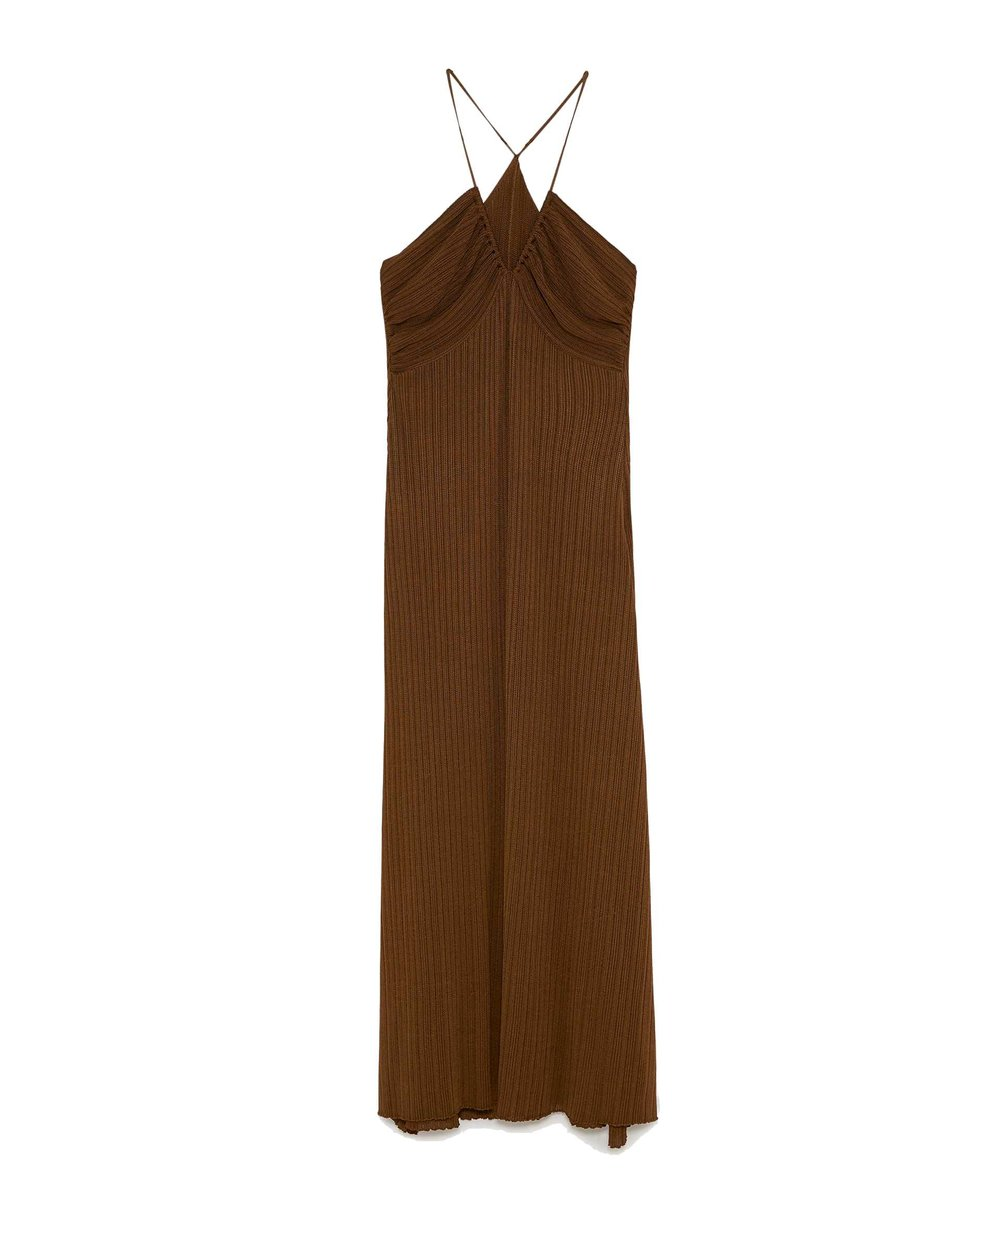 Zara Knit Spaghetti Strap Dress $69.90